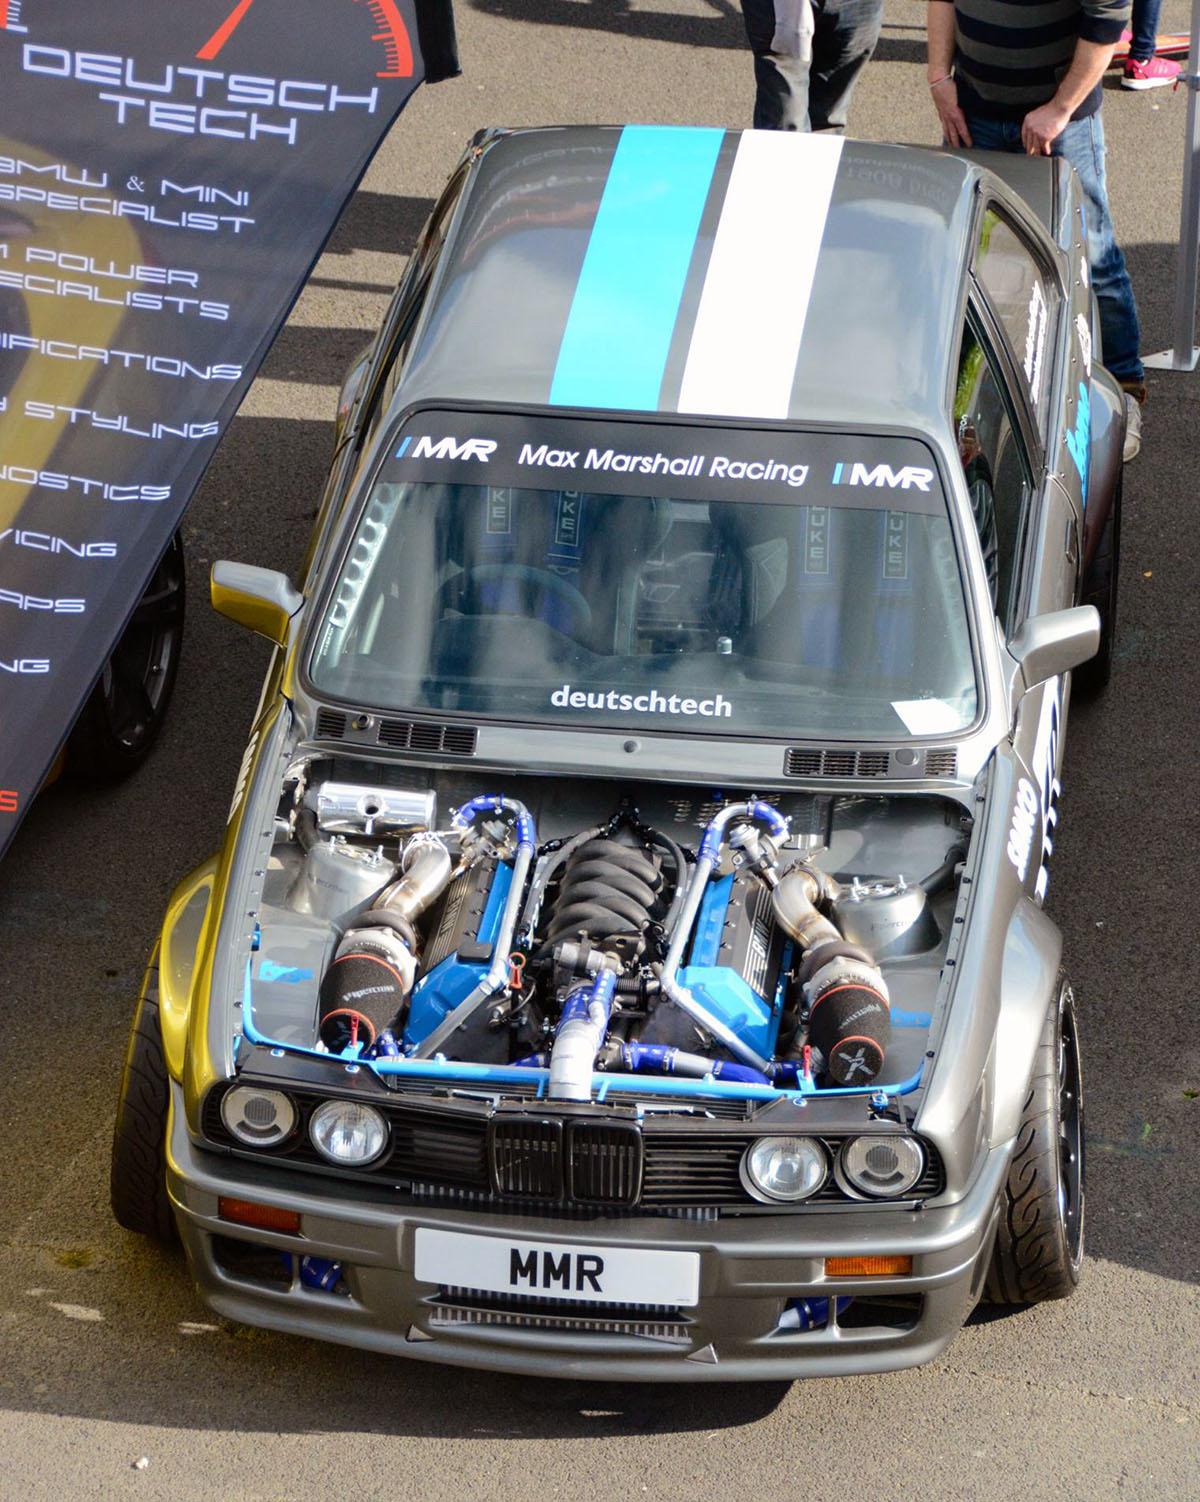 Bmw E30 With A Twin Turbo M60 Engine Swap Depot